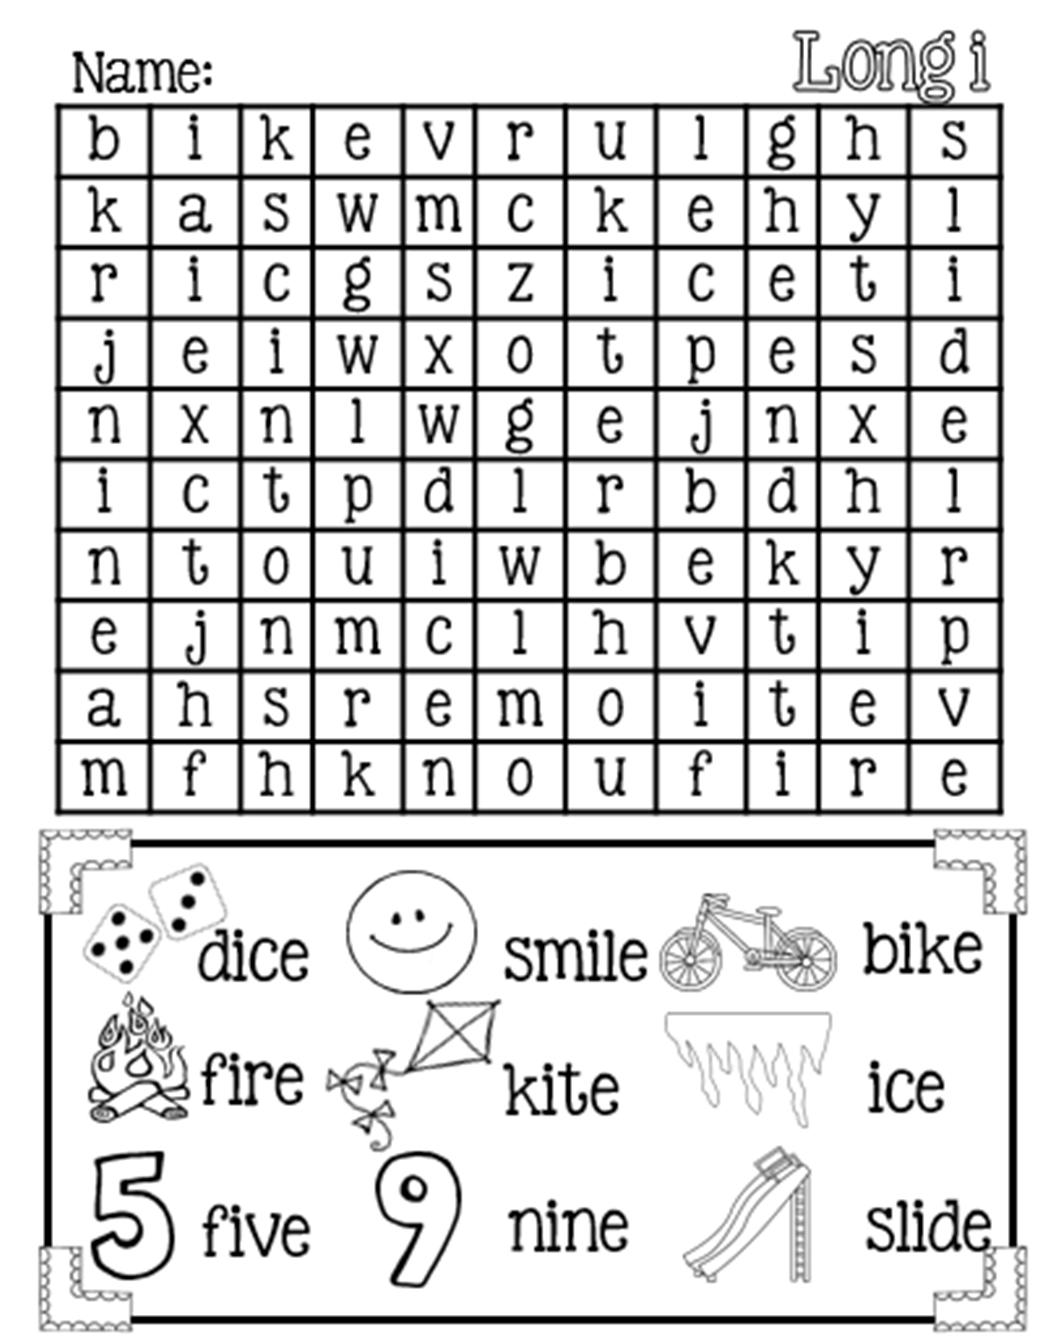 Magic E Long I Word Search {Free} | Elementary Classroom | Long I | Silent E Printable Worksheets